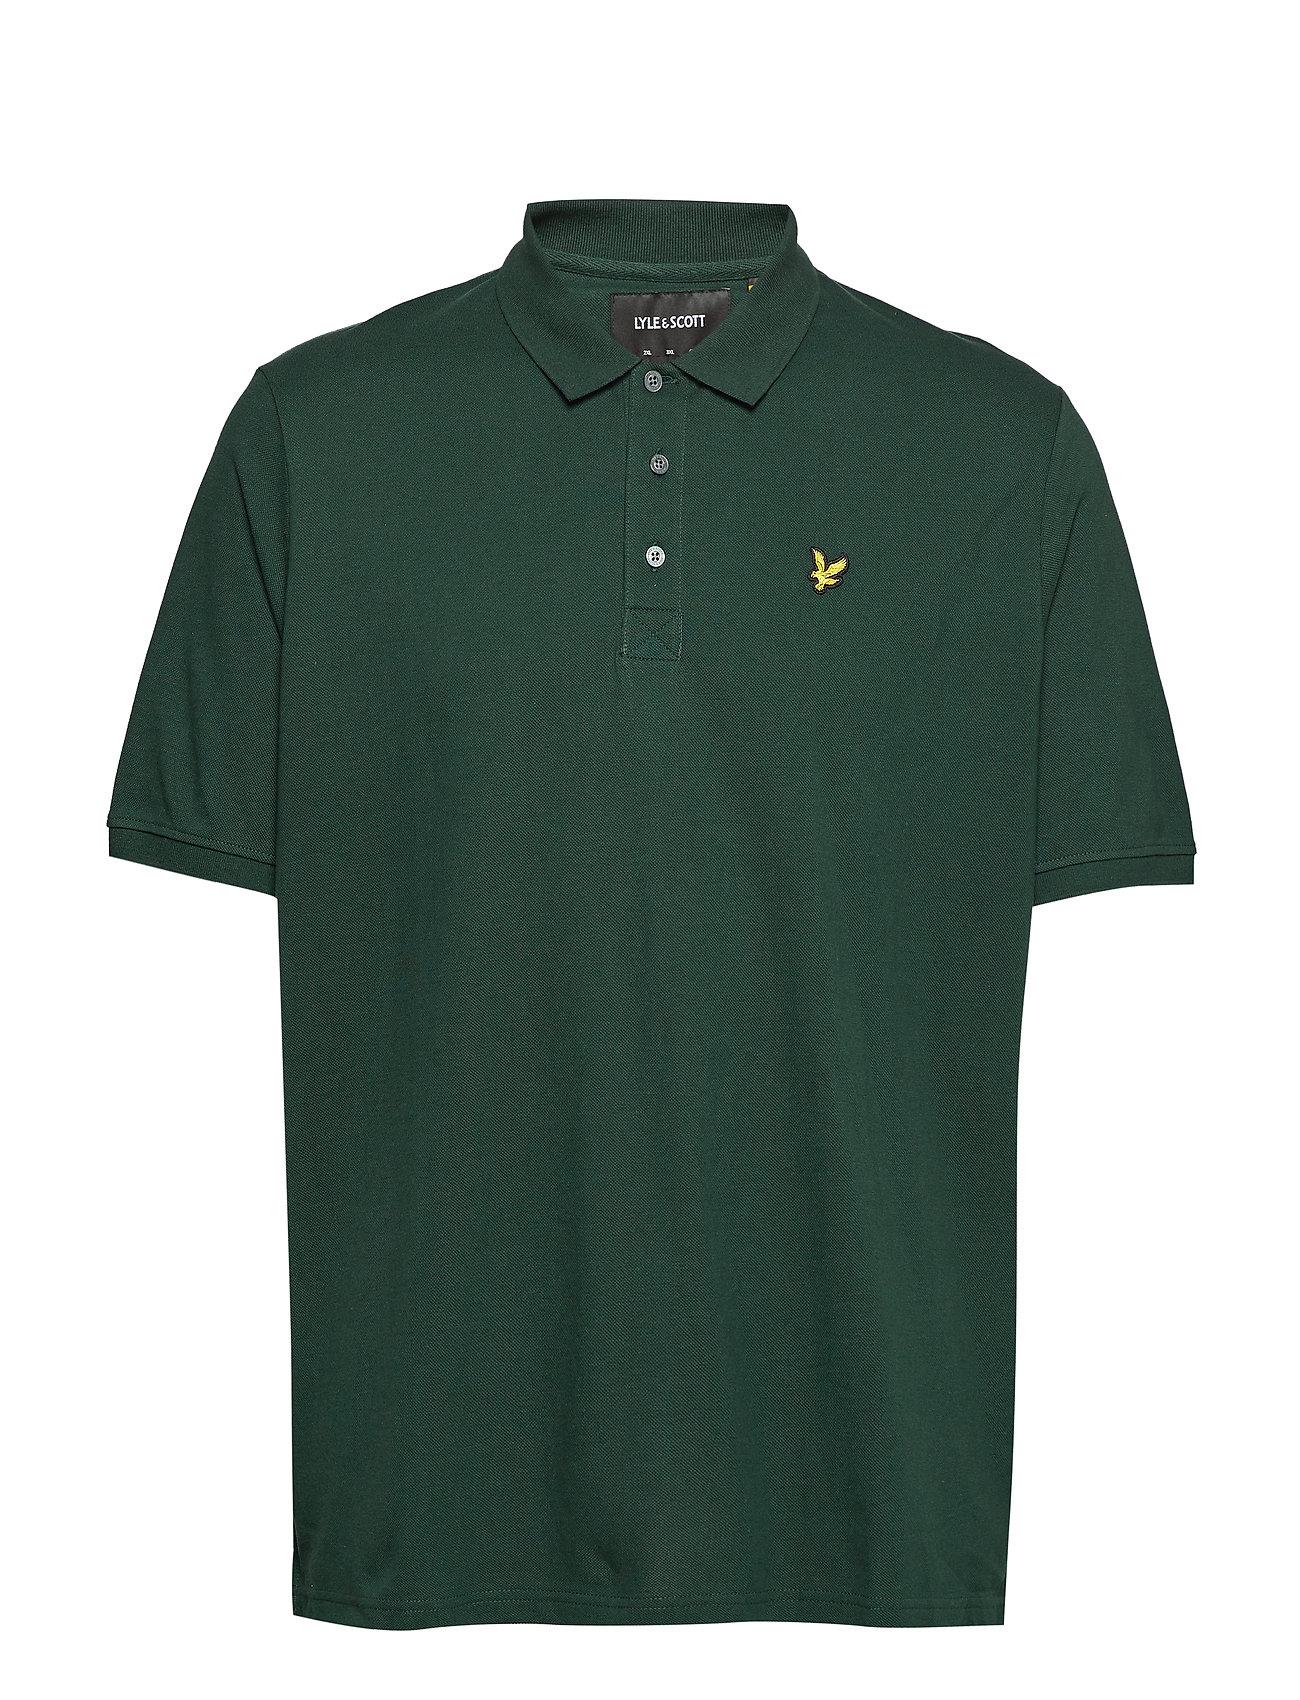 GreenLyleamp; Scott Scott GreenLyleamp; Plain Shirtjade Plain Shirtjade Polo Polo N0mPy8wnvO